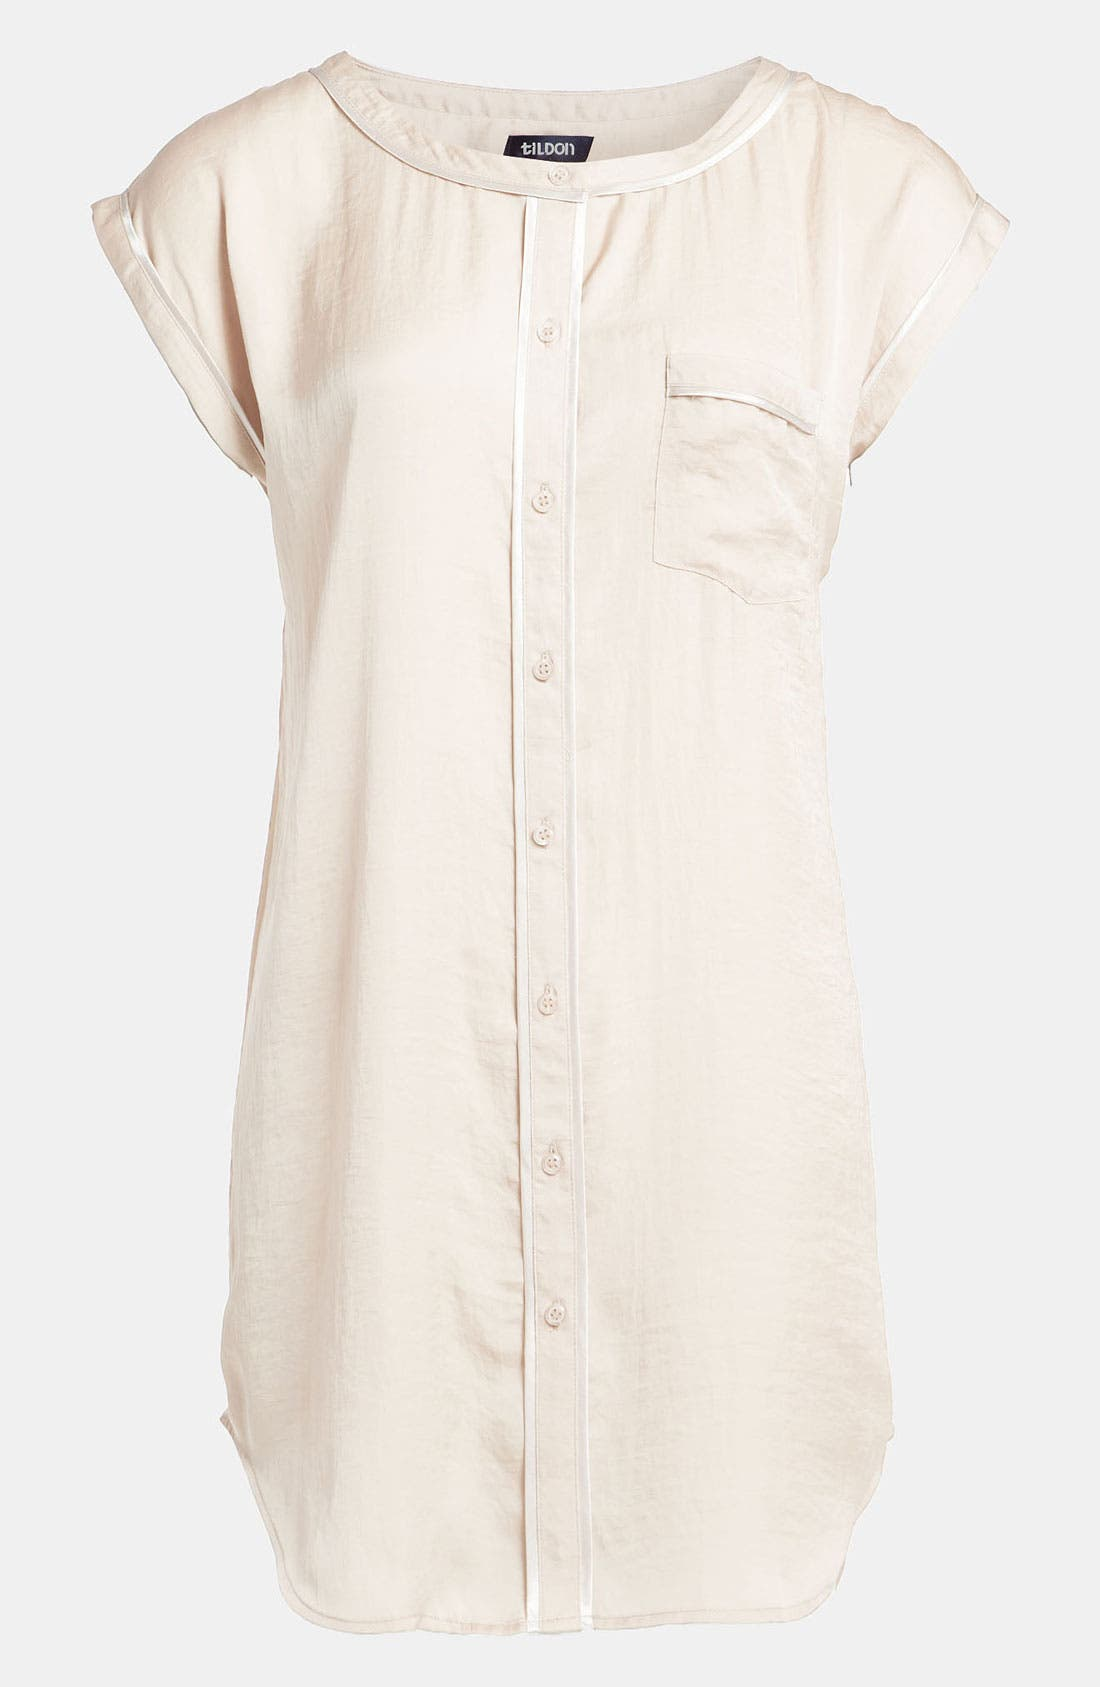 Alternate Image 1 Selected - Tildon 'Pajama' Tunic Top